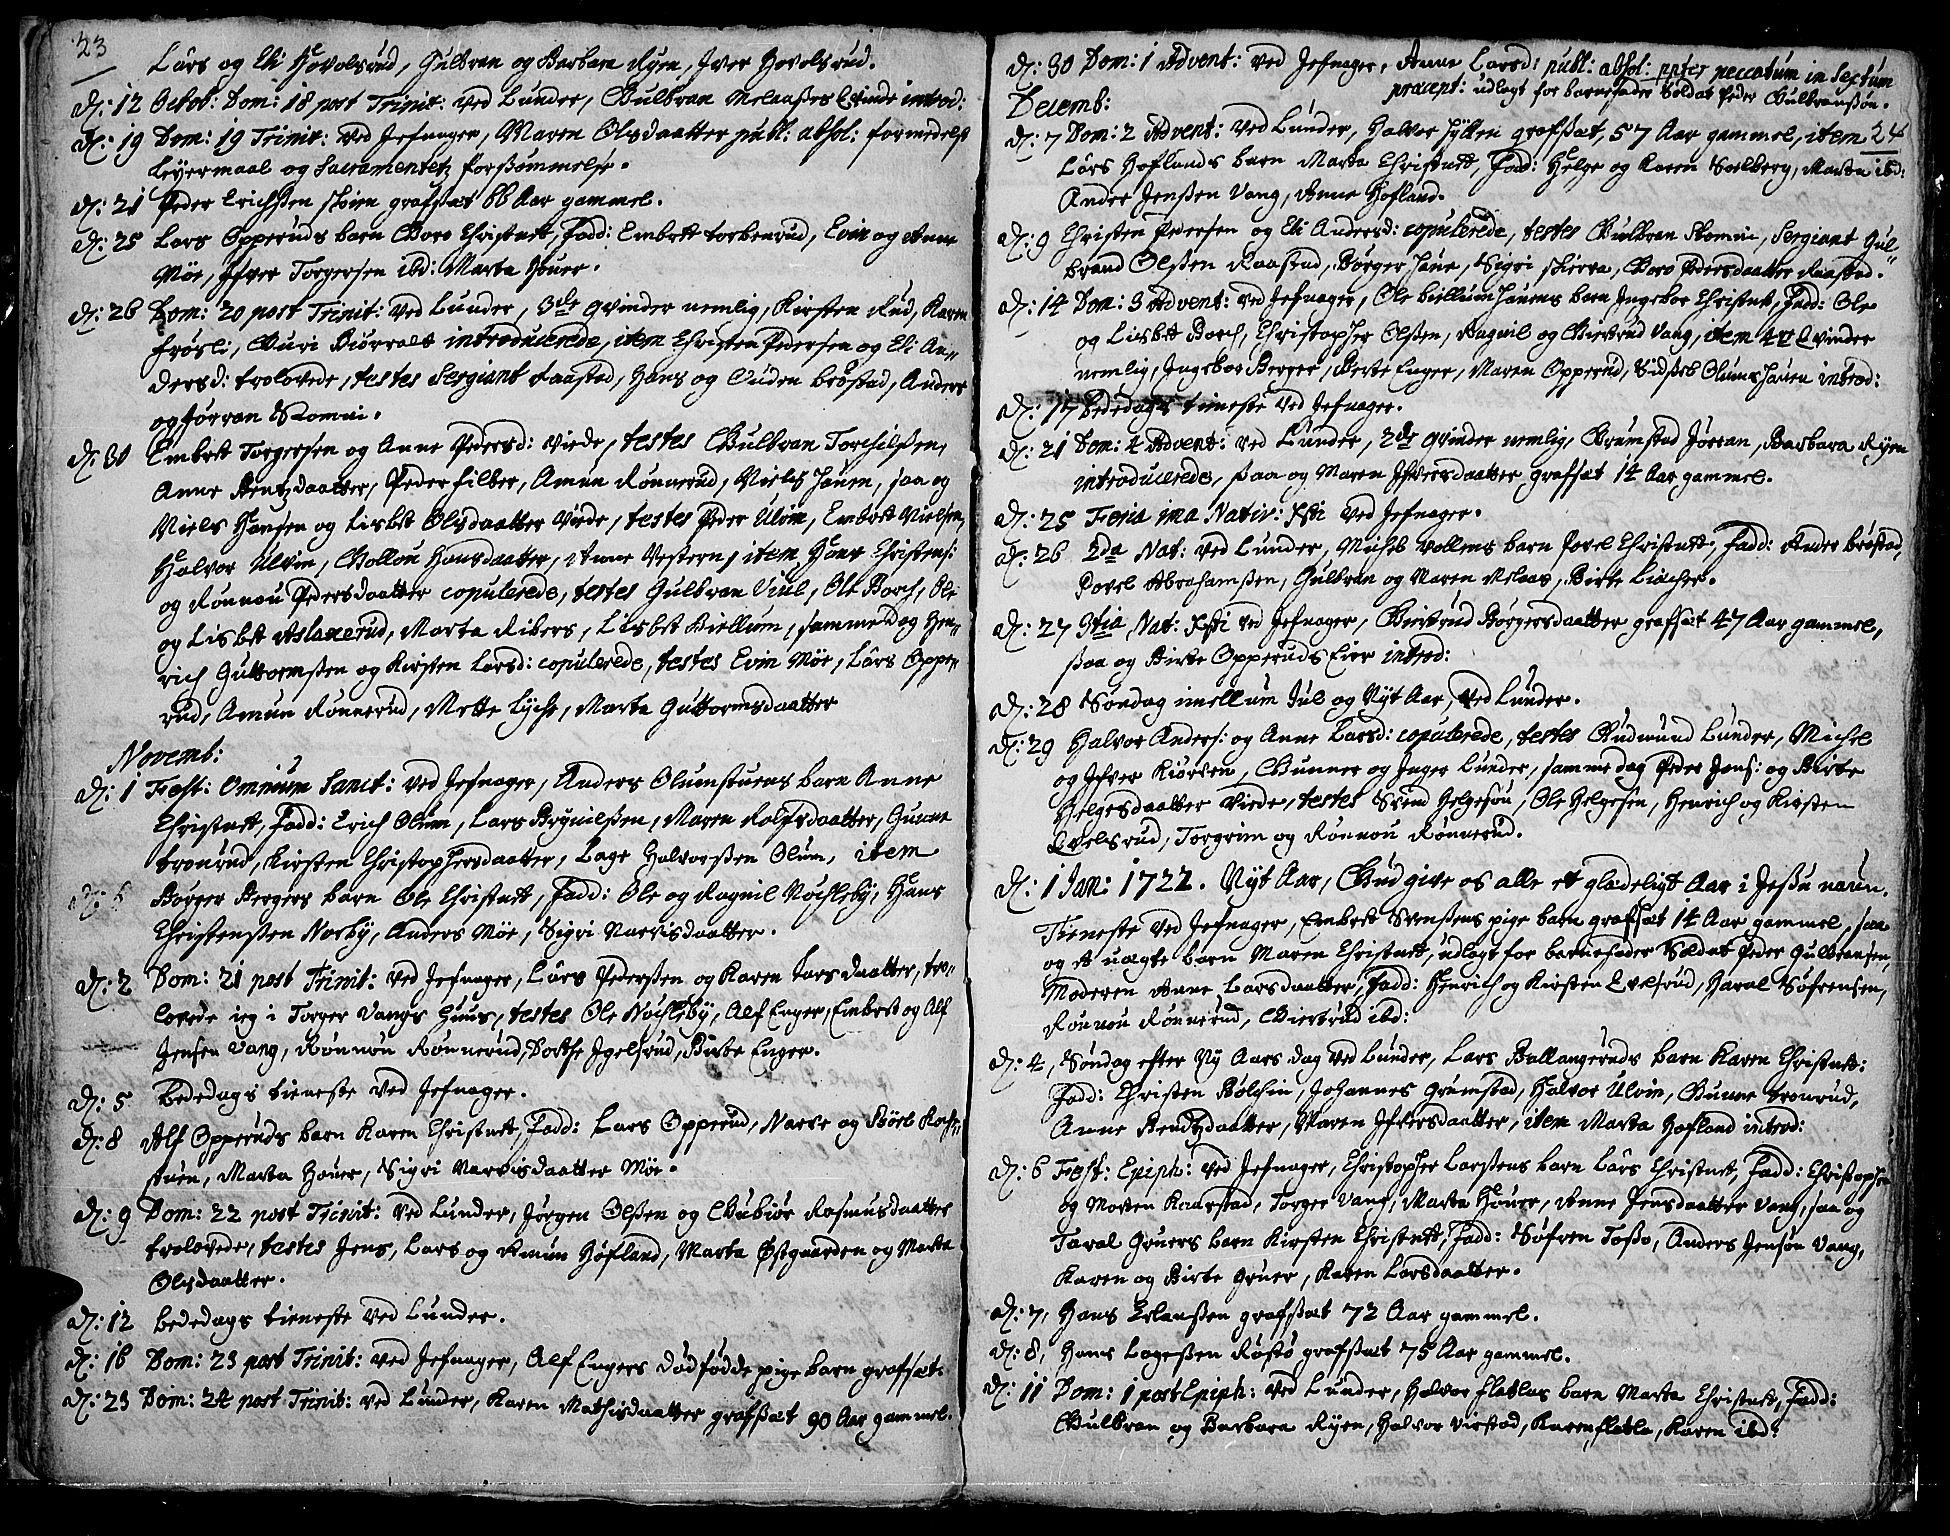 SAH, Jevnaker prestekontor, Ministerialbok nr. 1, 1718-1725, s. 23-24